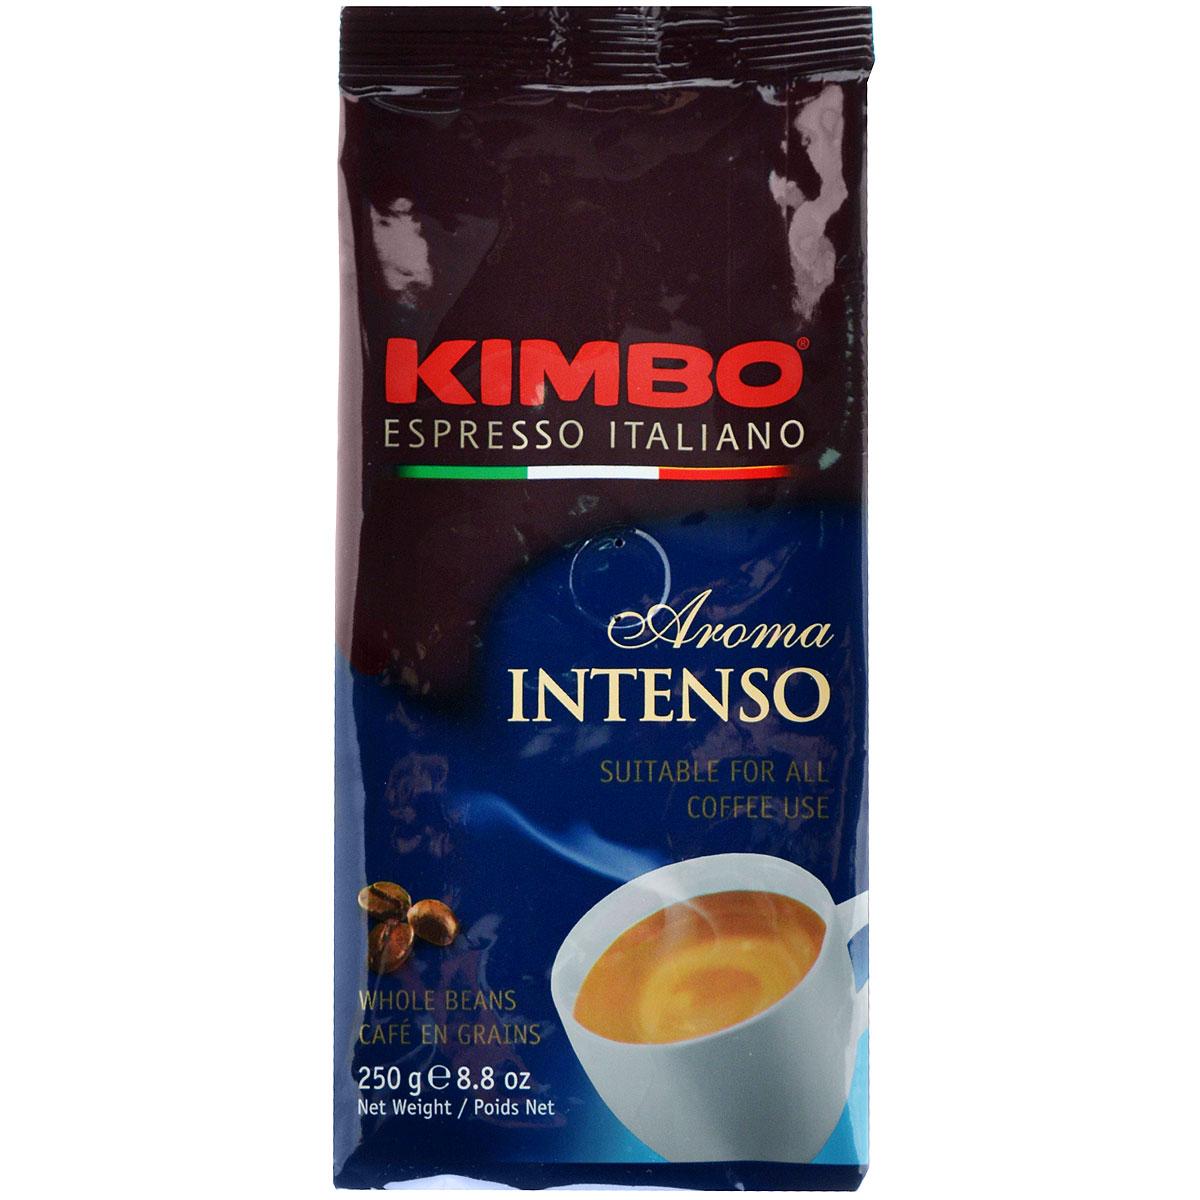 Kimbo Aroma Intenso кофе в зернах, 250 г цена